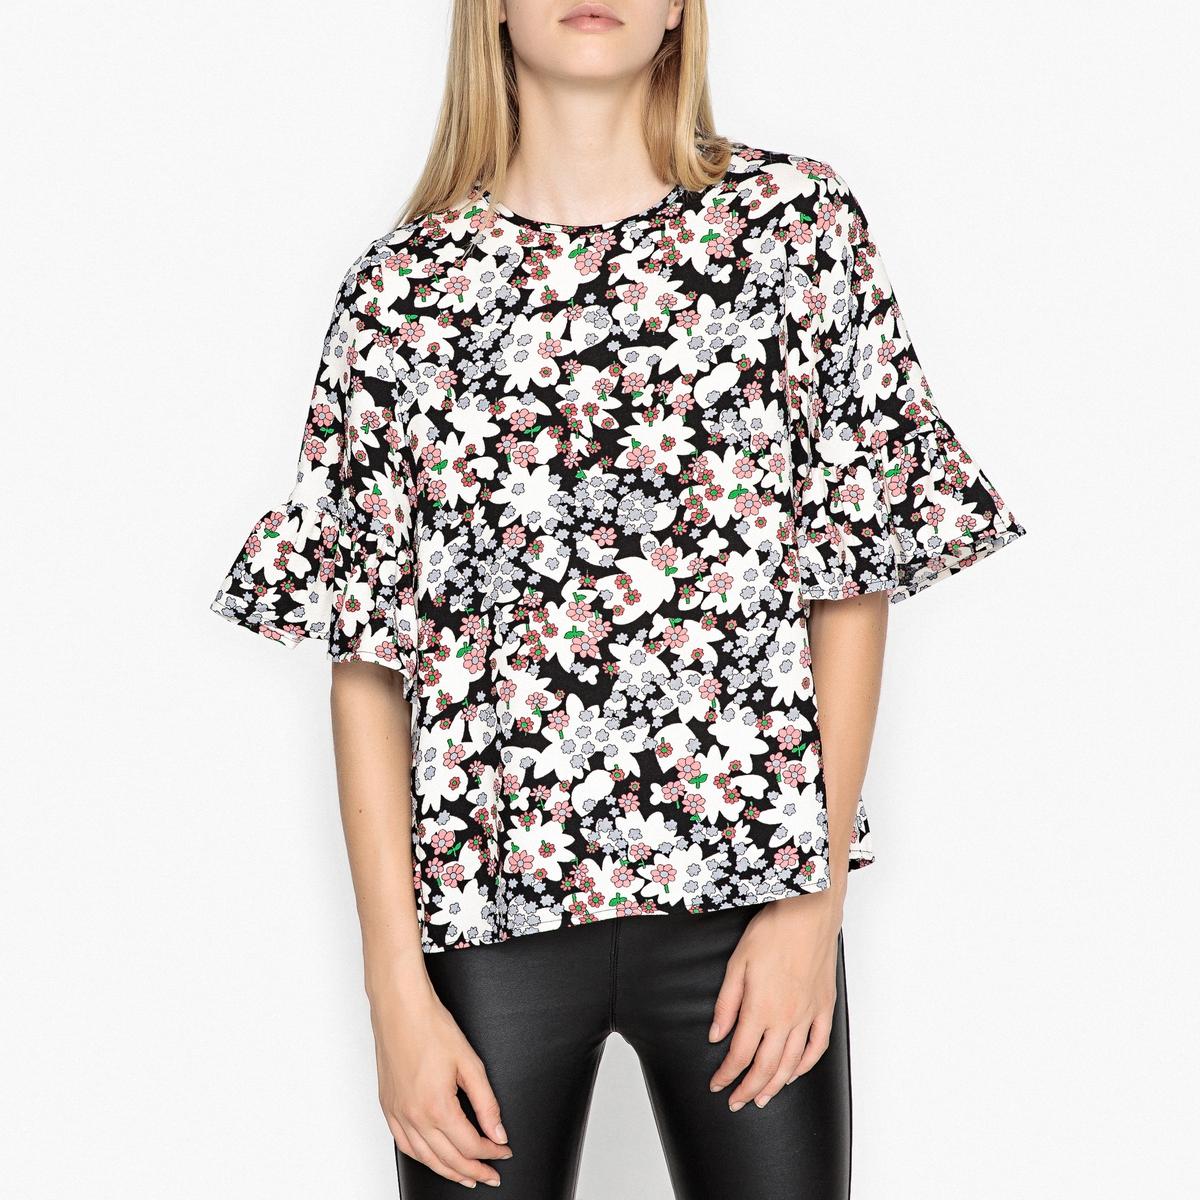 Блуза с рукавами 3/4 ROCKNROLL msgm топ с крупными воланами